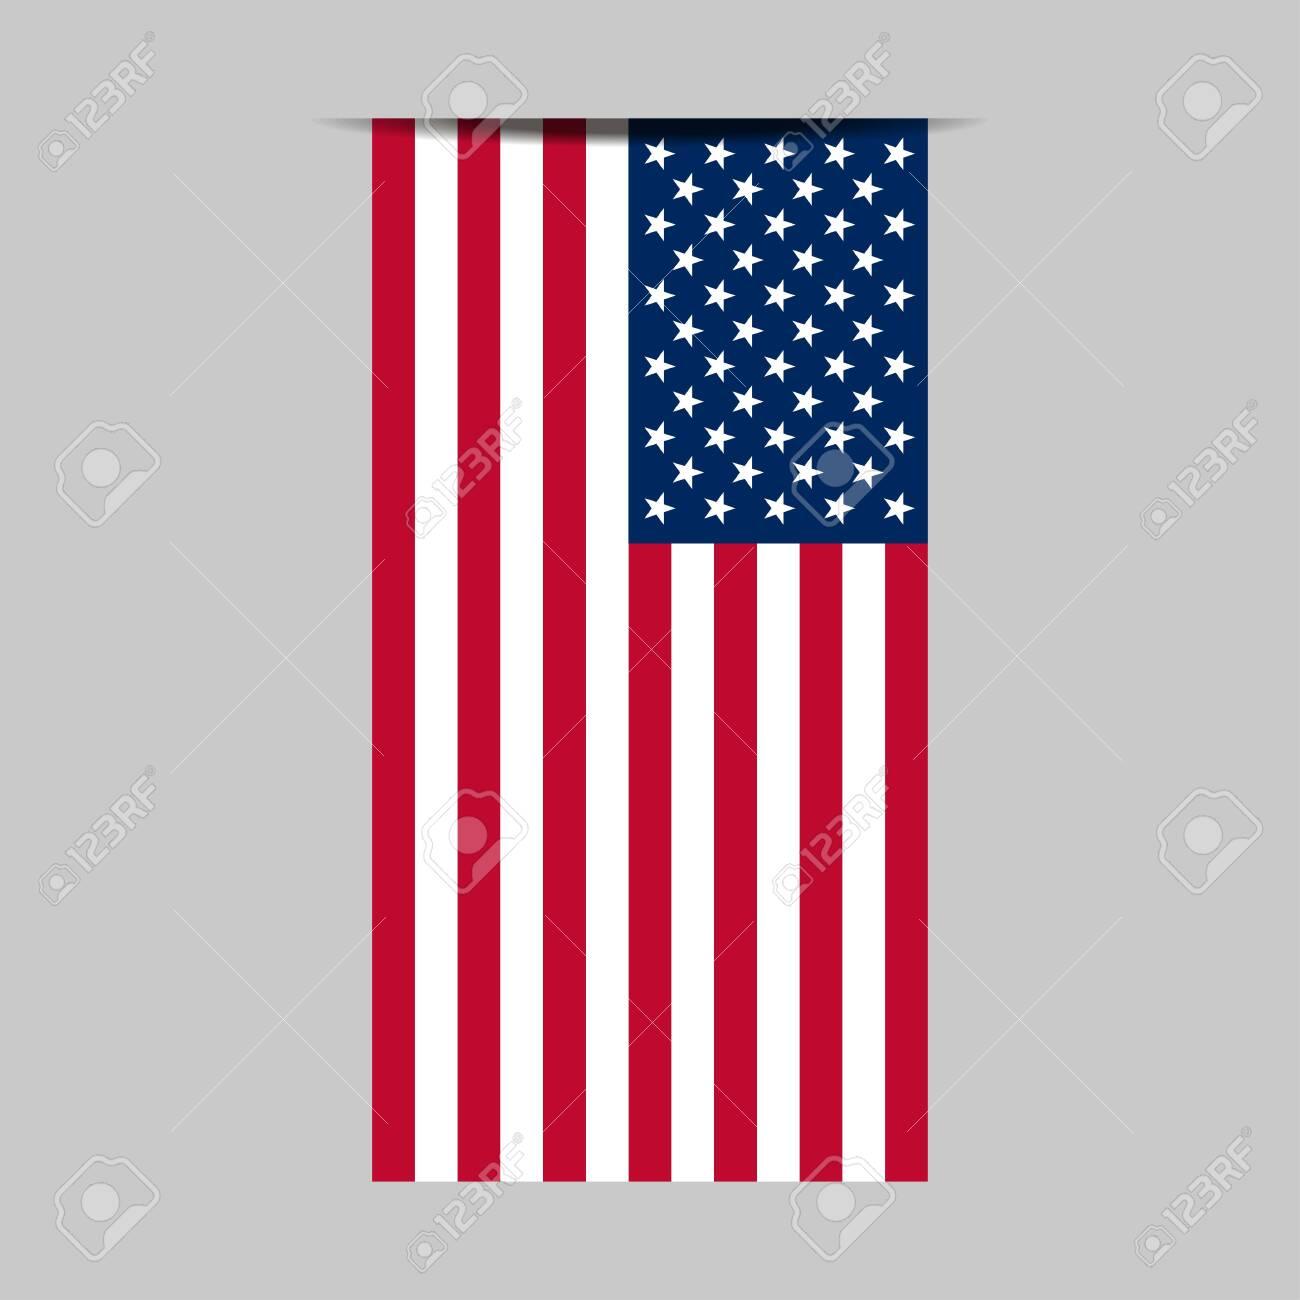 United States flag vector illustration. American flag icon - 138869671